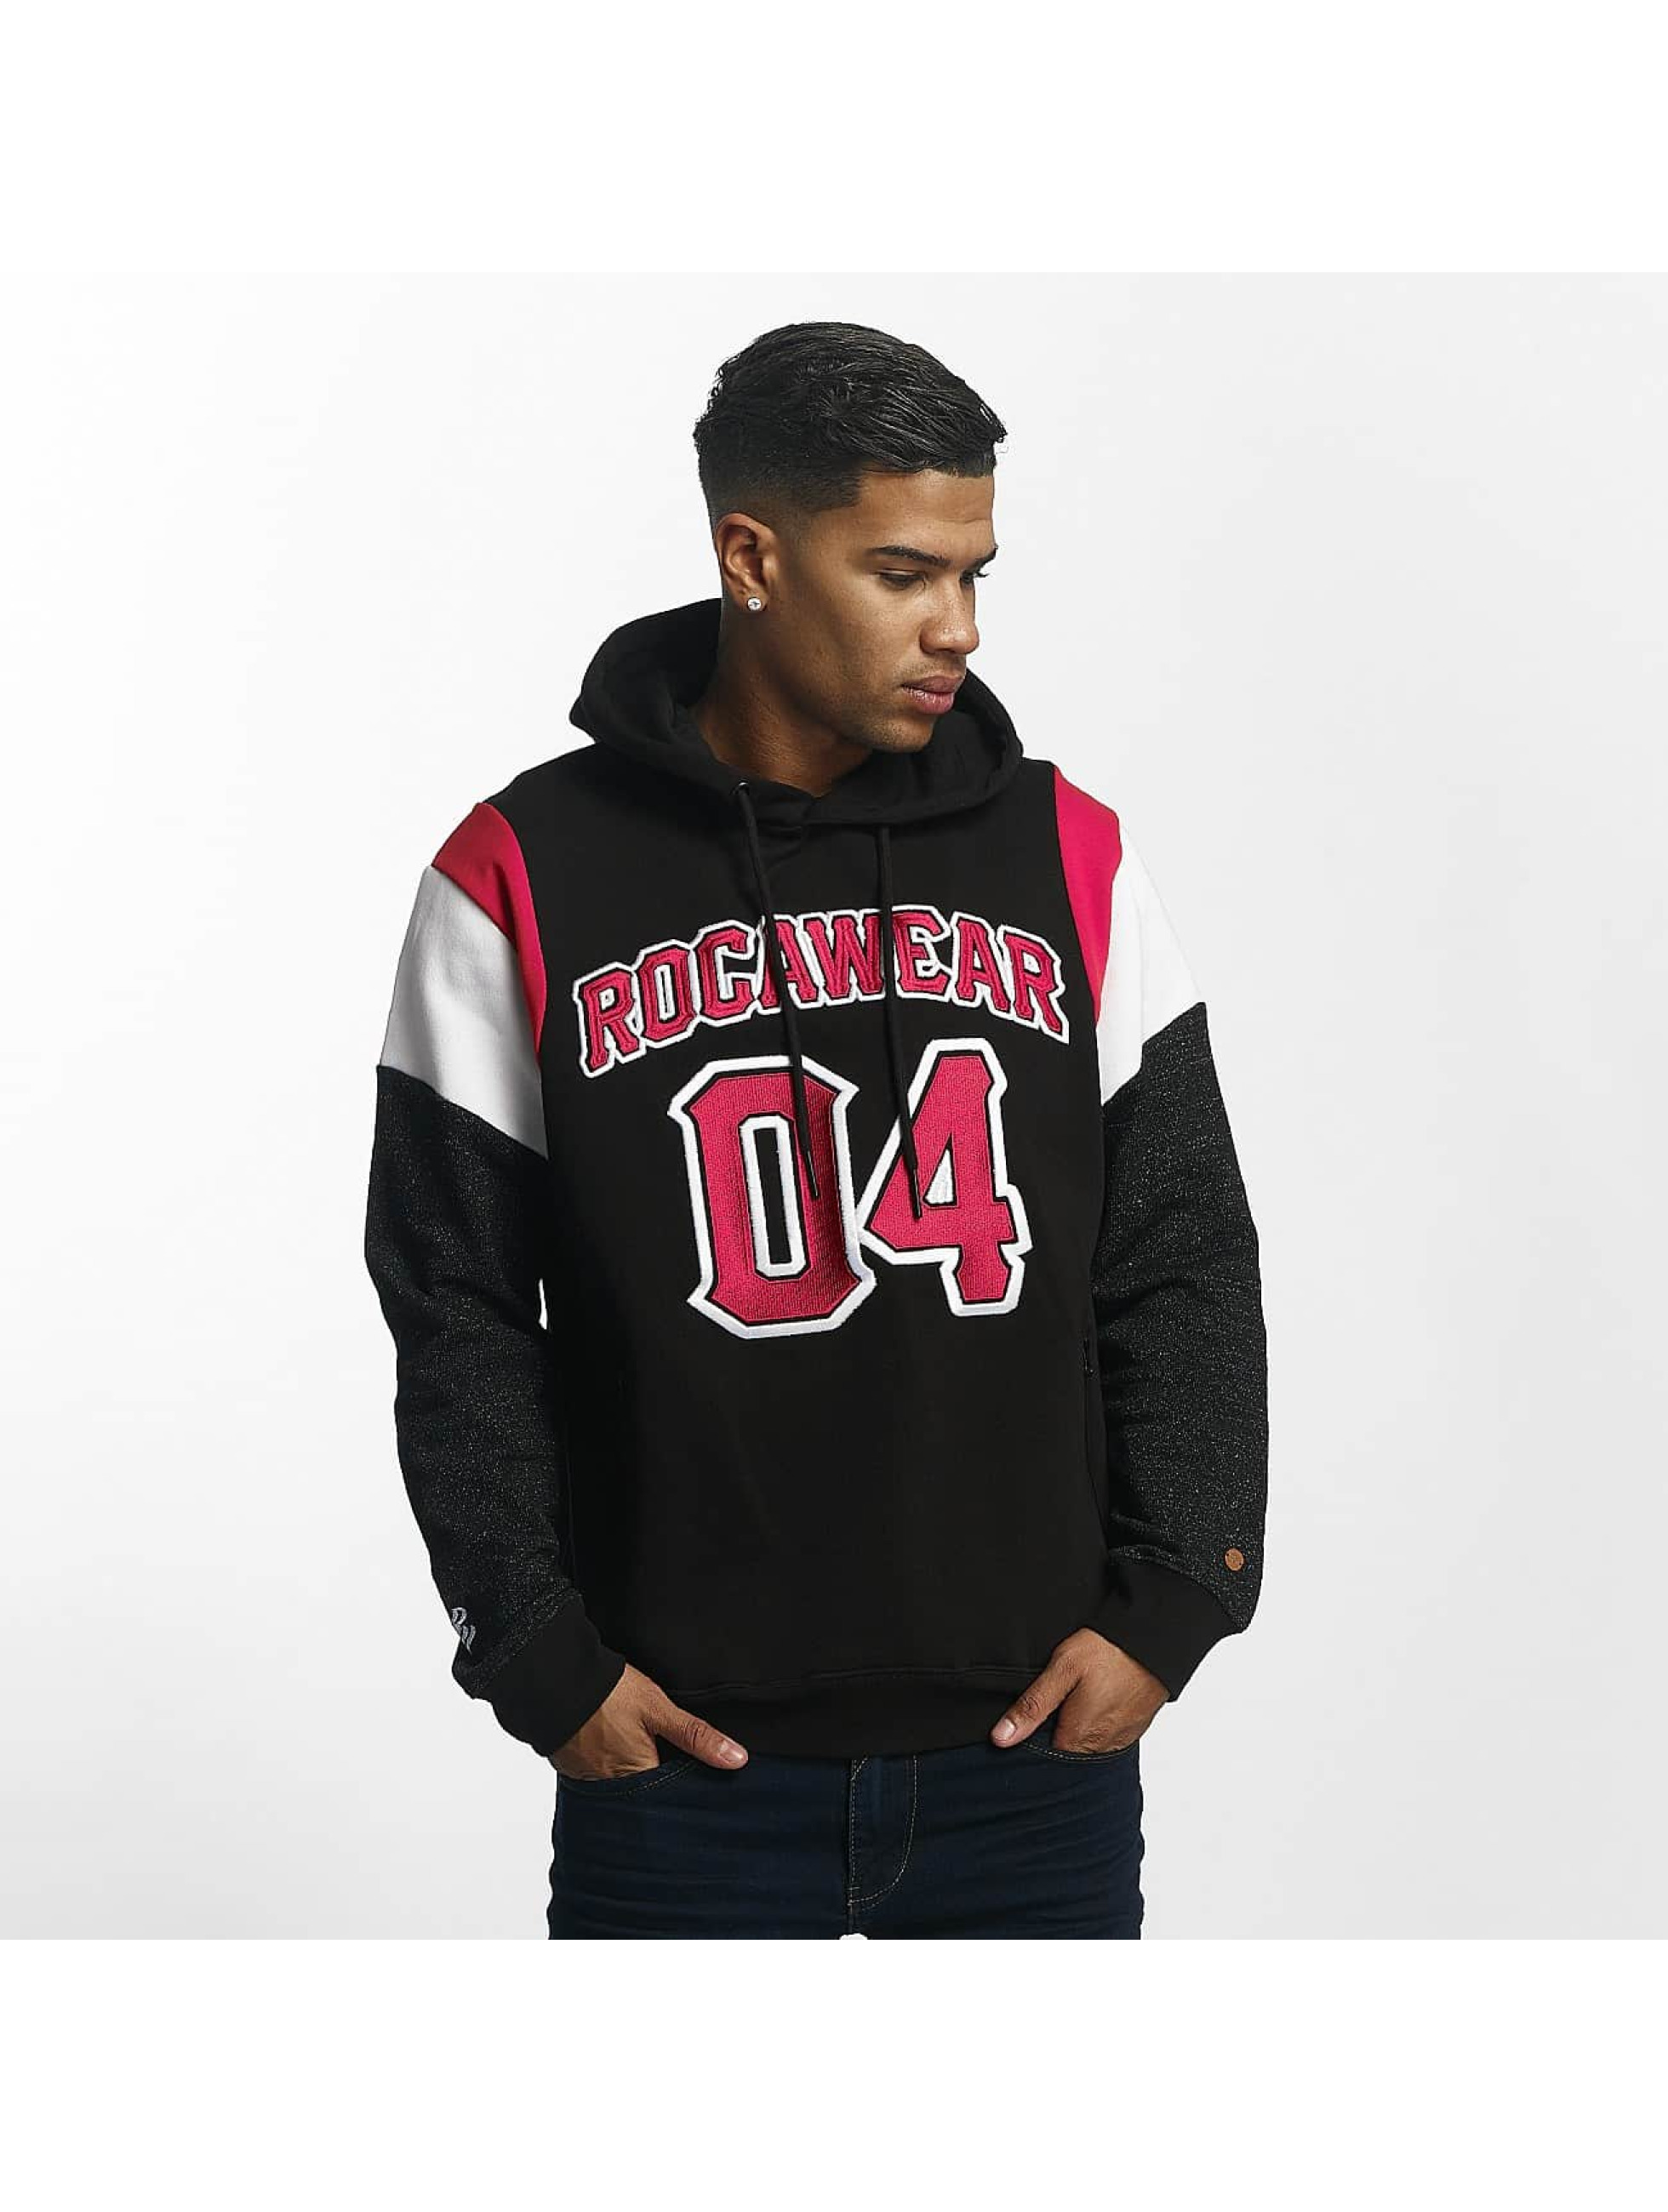 Rocawear / Hoodie Number Four in black 2XL